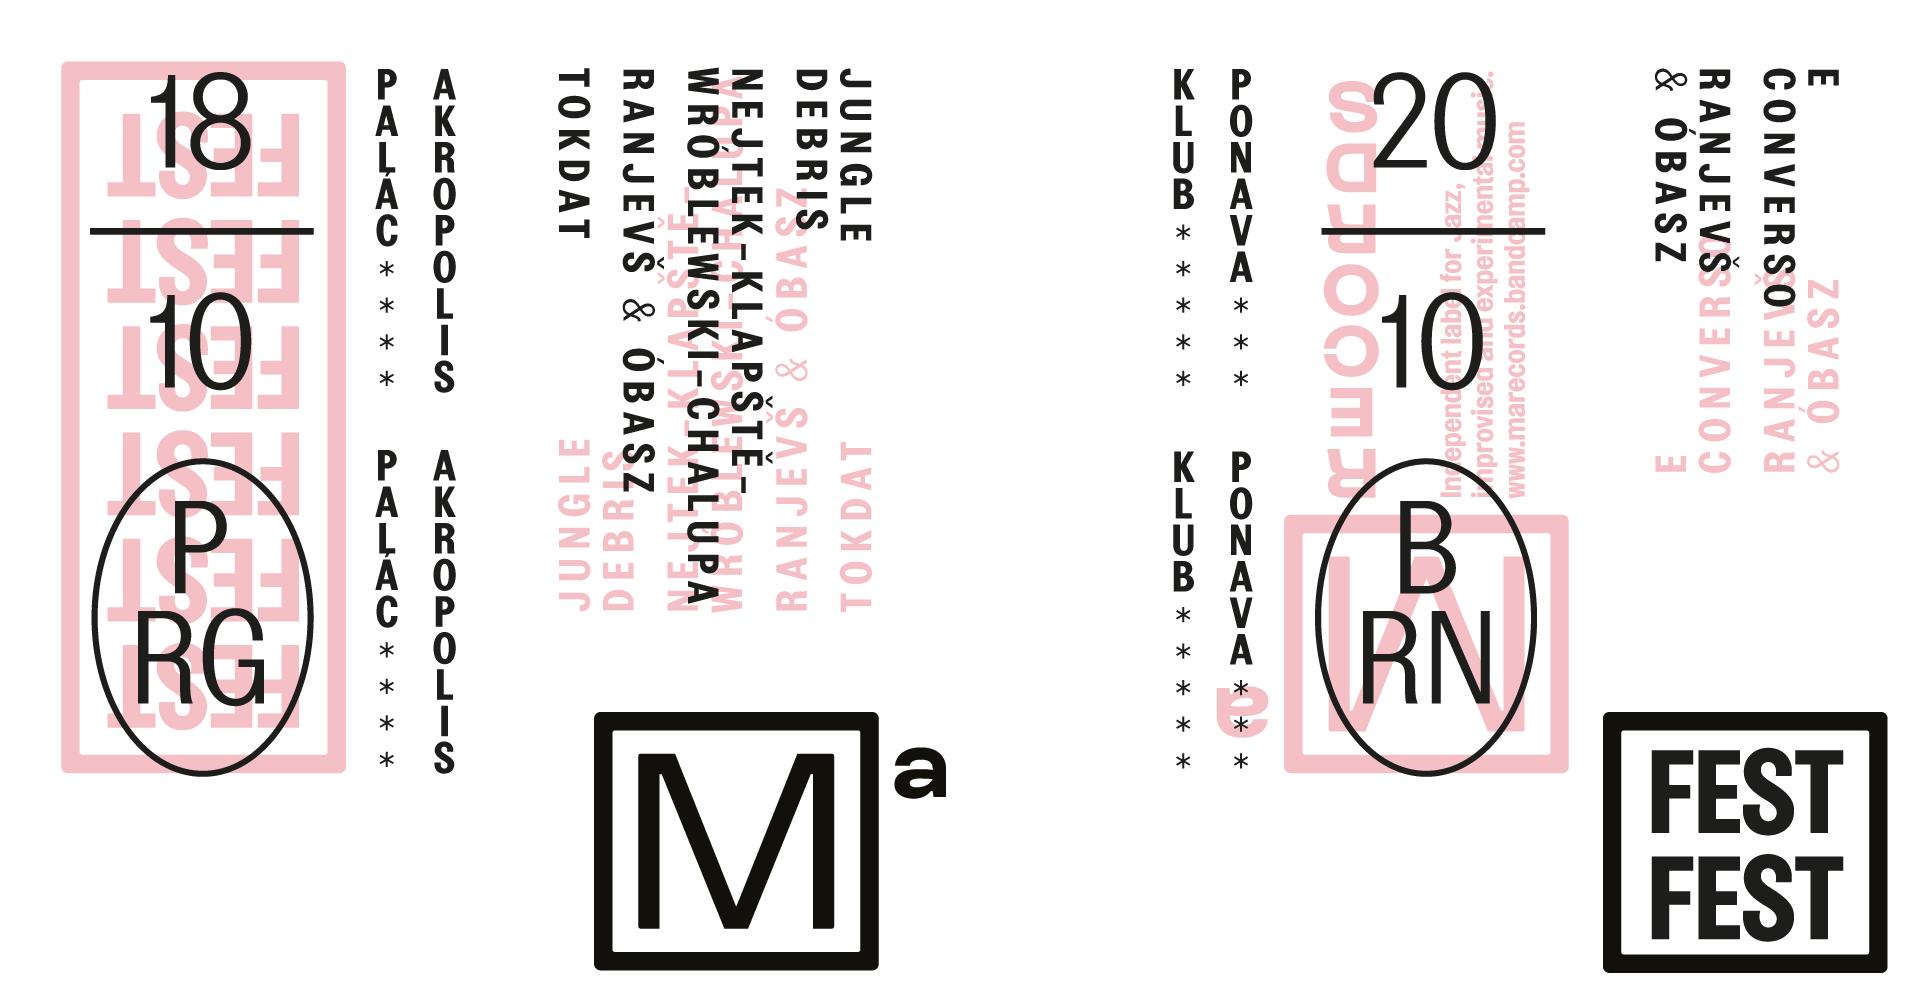 MaFest: Ranjevš & Óbazs + E Converso